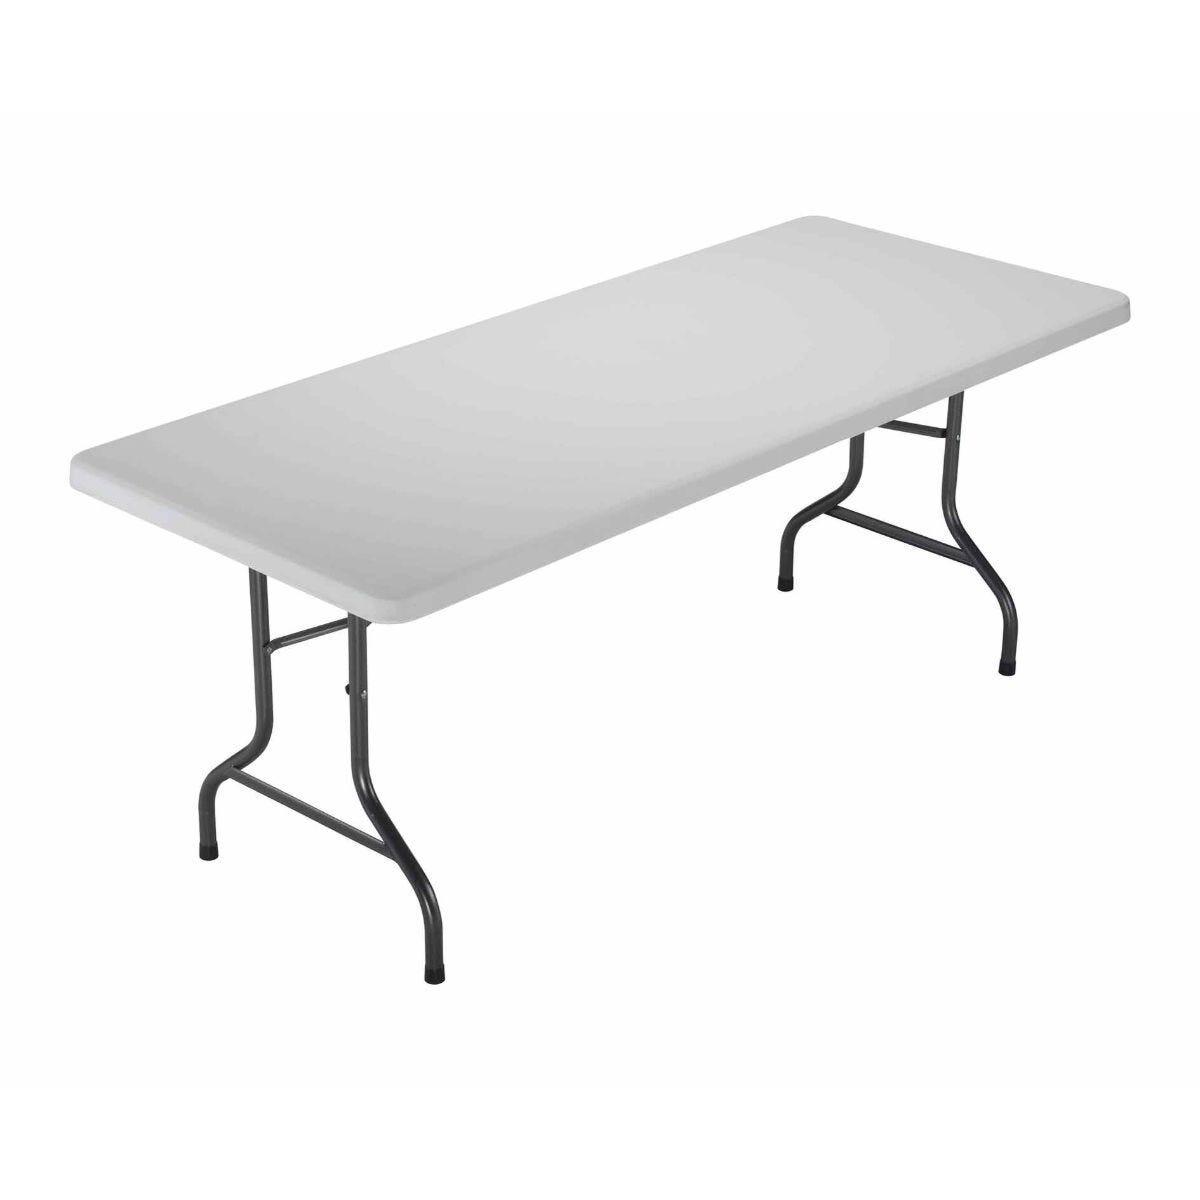 TC Office Morph Rectangular Polypropylene Folding Table 1520mm